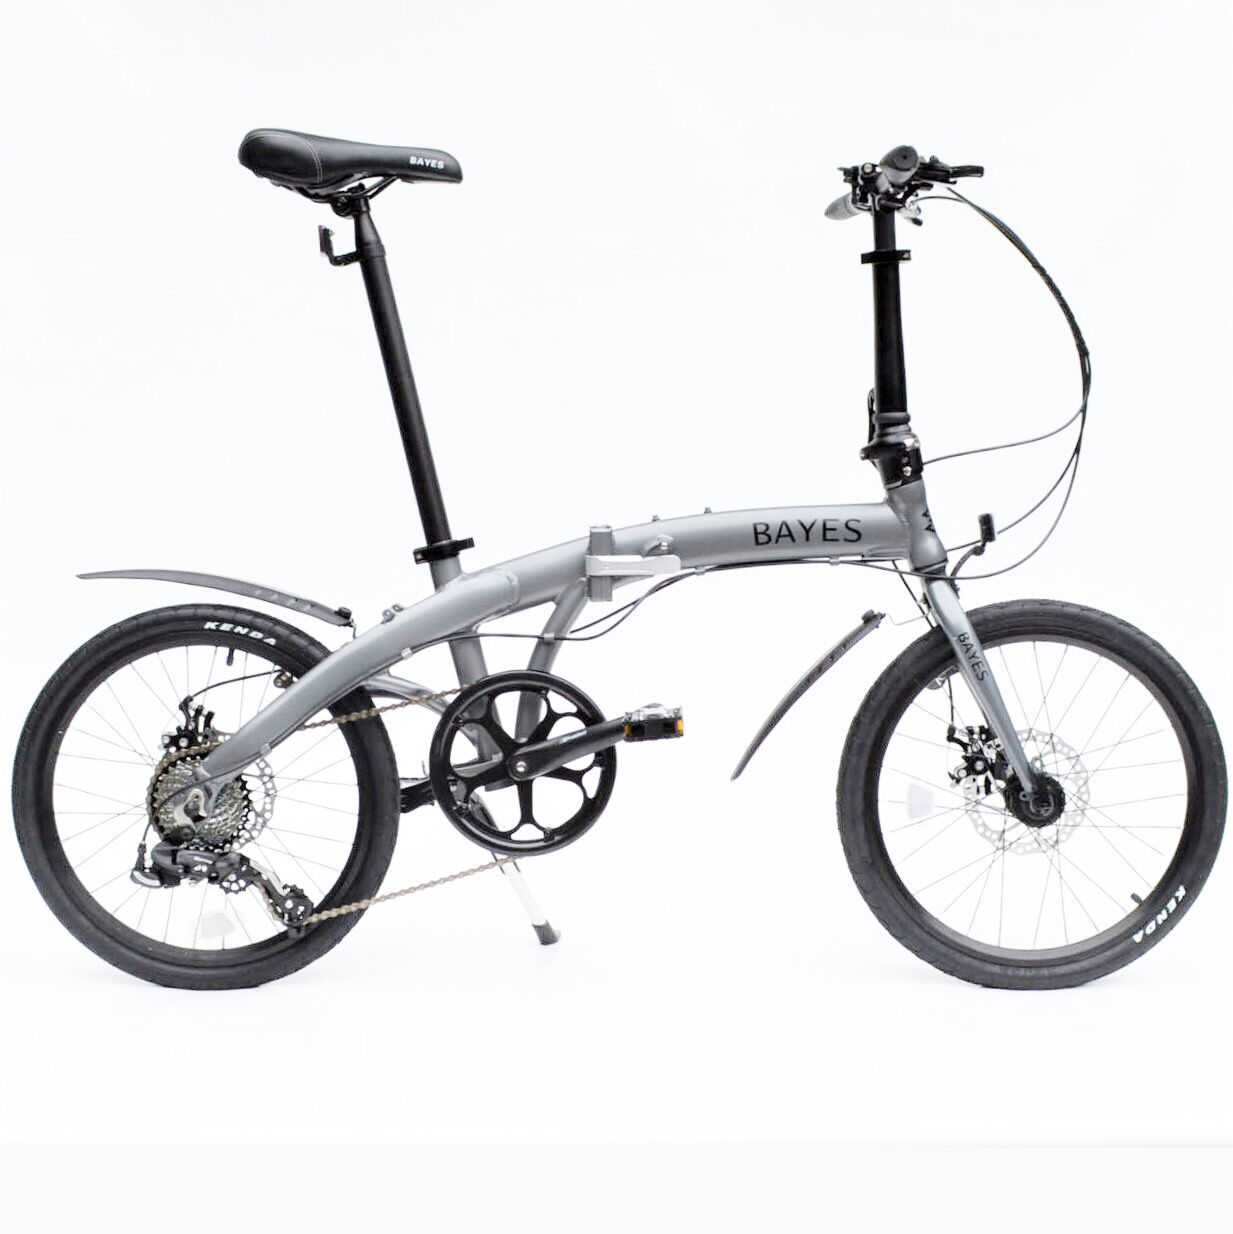 ALU Klapprad 20  Faltrad Fahrrad 8 Gang Shimano Scheibenbremsen grey matt NEU